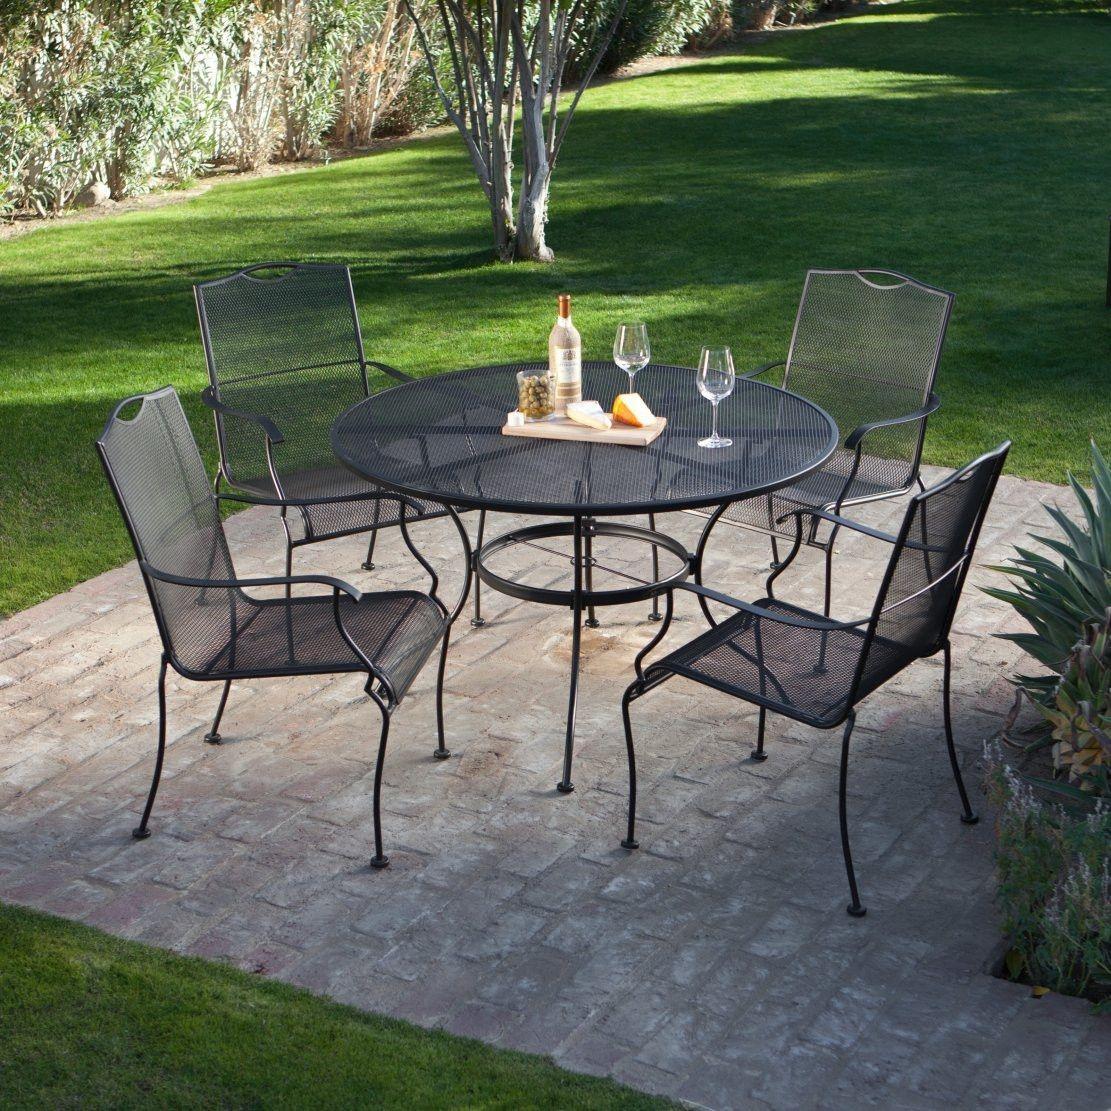 5 Piece Wrought Iron Patio Furniture Dining Set Seats 4 regarding dimensions 1111 X 1111